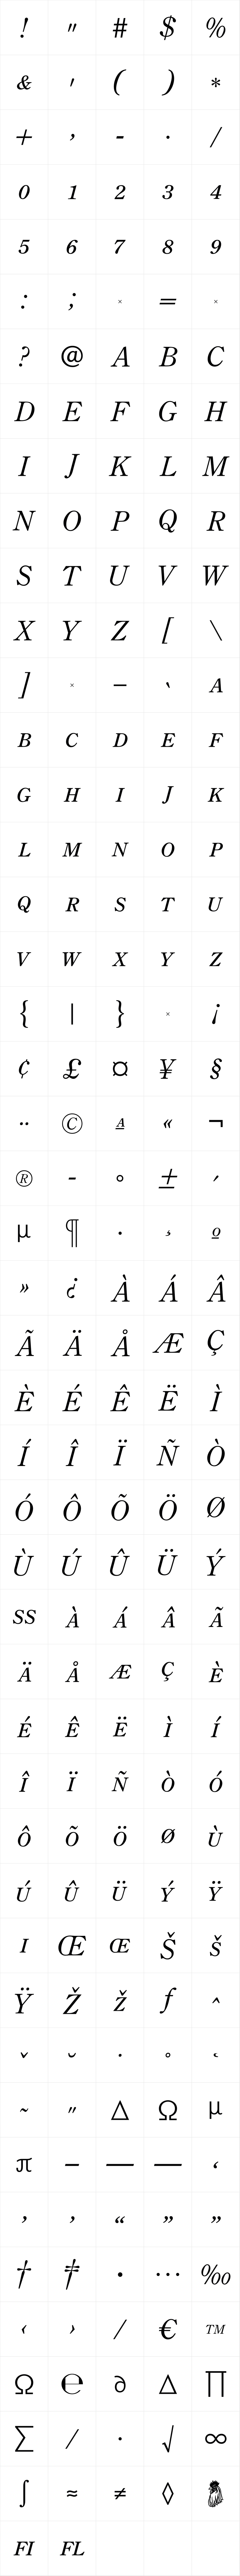 TCCenturyNewStyleExpert Light Italic